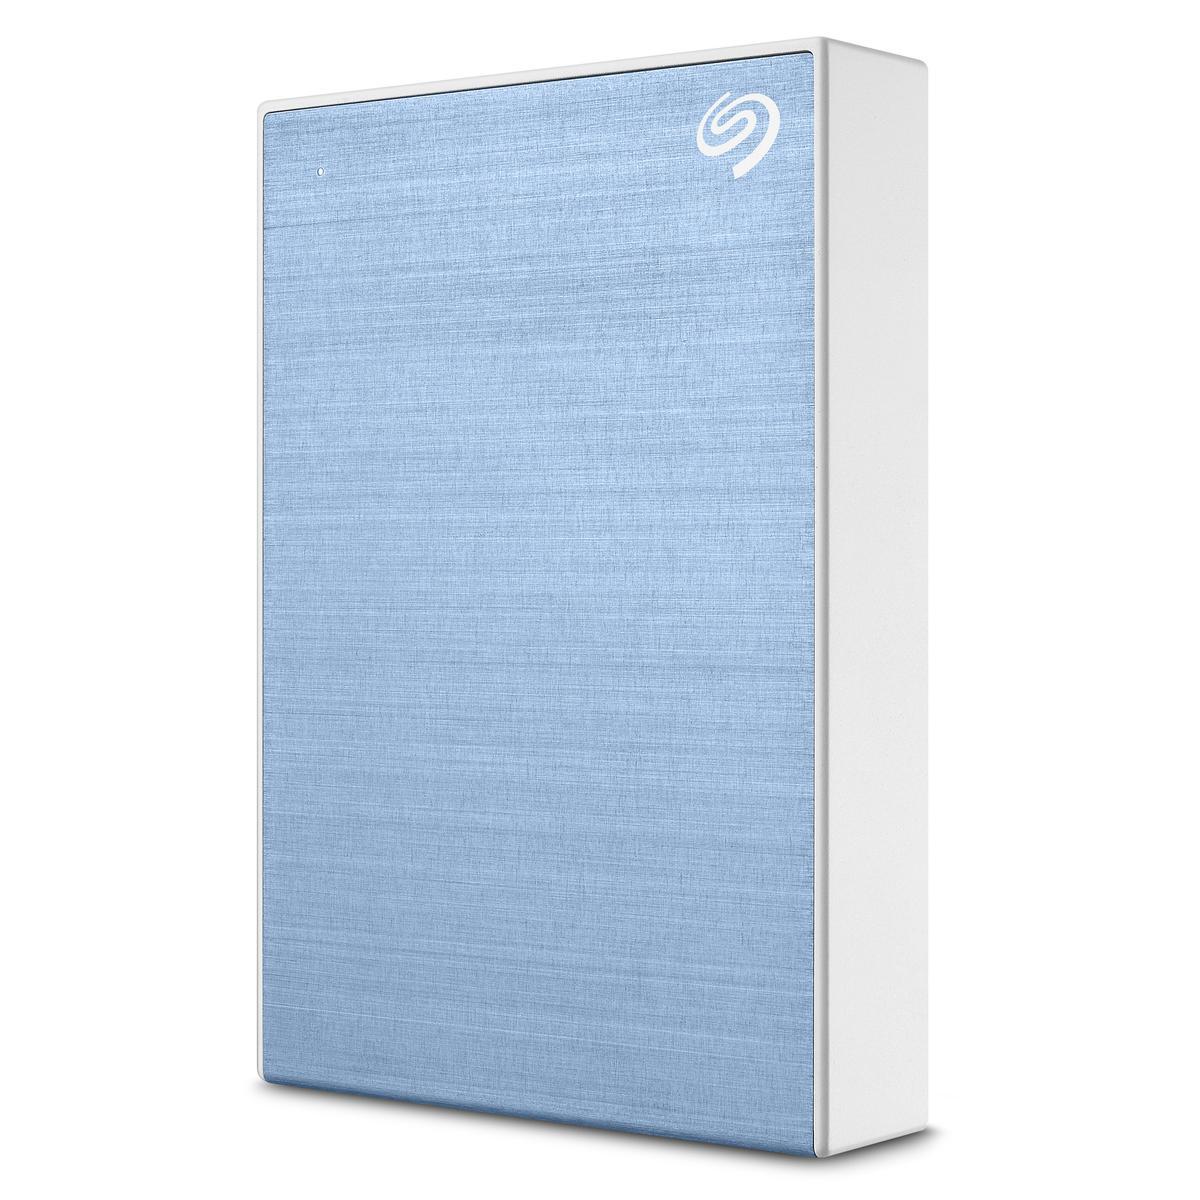 Seagate Backup Plus Portable 4 TB External Hard Drive